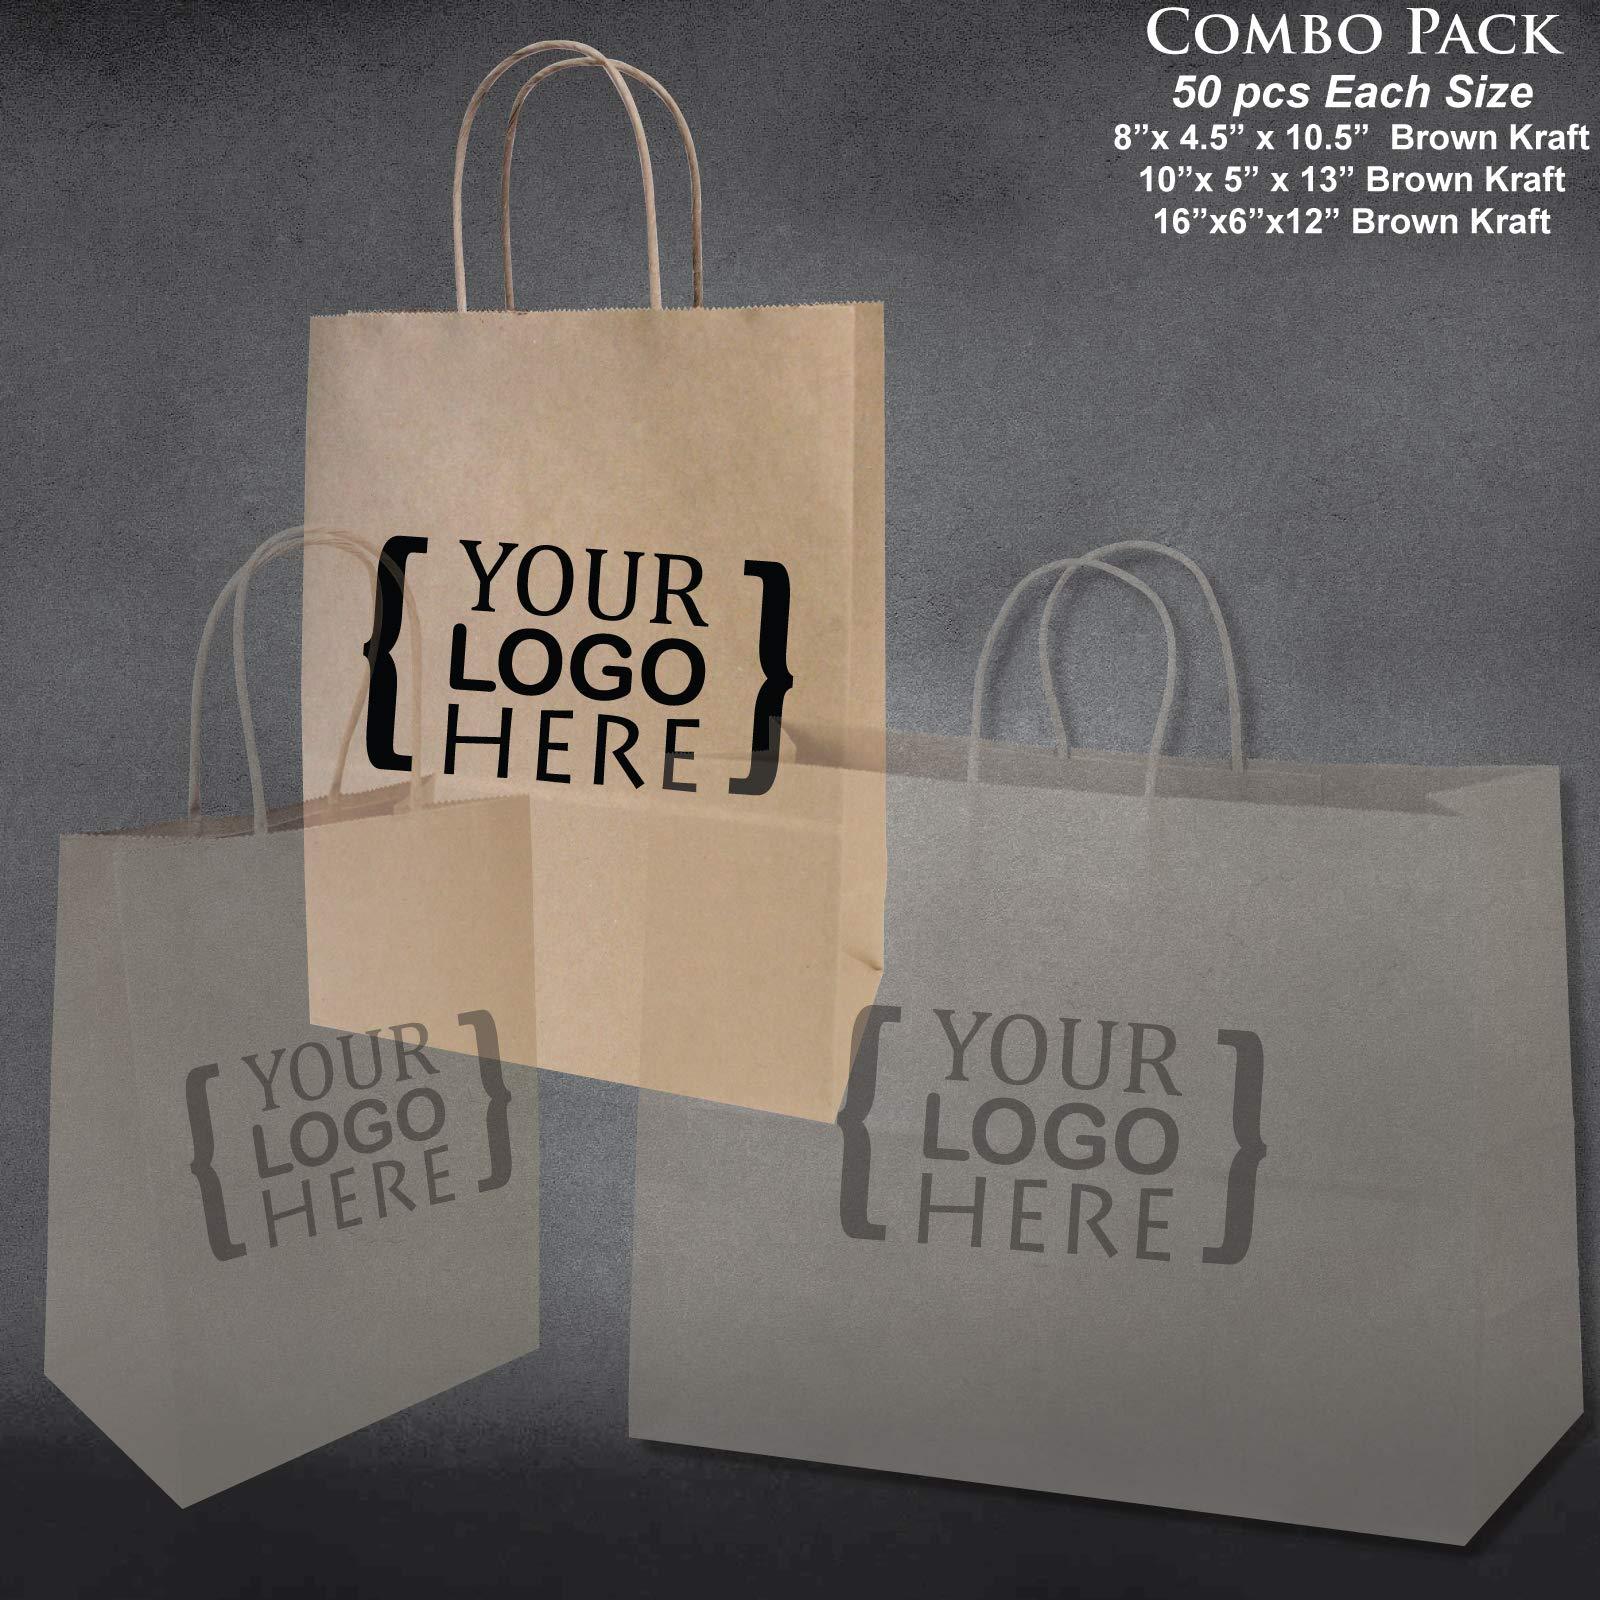 8''x4.75''x10''-10''x5''x13''-16''x6''x12'' - 50 Pcs Each - Custom Printed Bagsource Brown Kraft Paper Bags 95% Post Consumer Materials & FSC Certified … (Custom Printed) by Bag Source (Image #3)